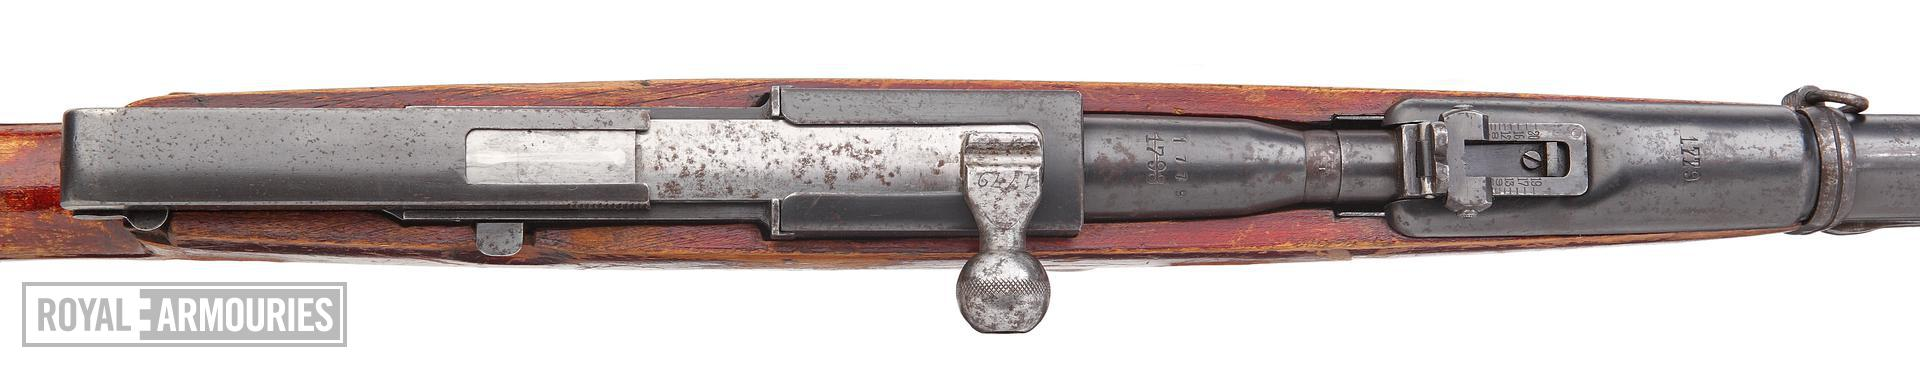 Federov Model 1916 rifle.